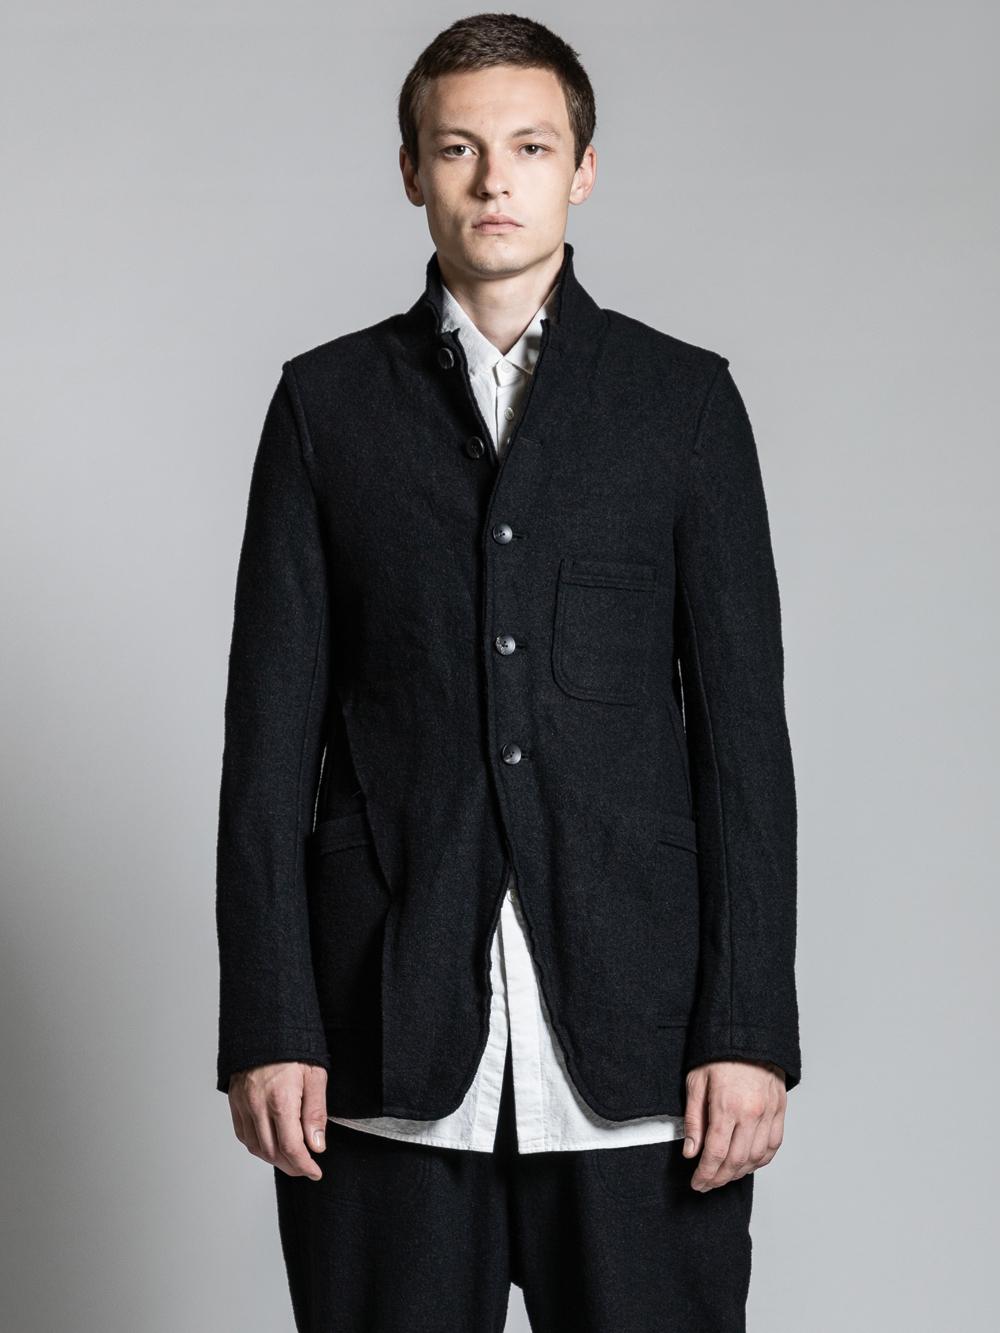 VI-2946-06 / 縮絨ウール ジャケット